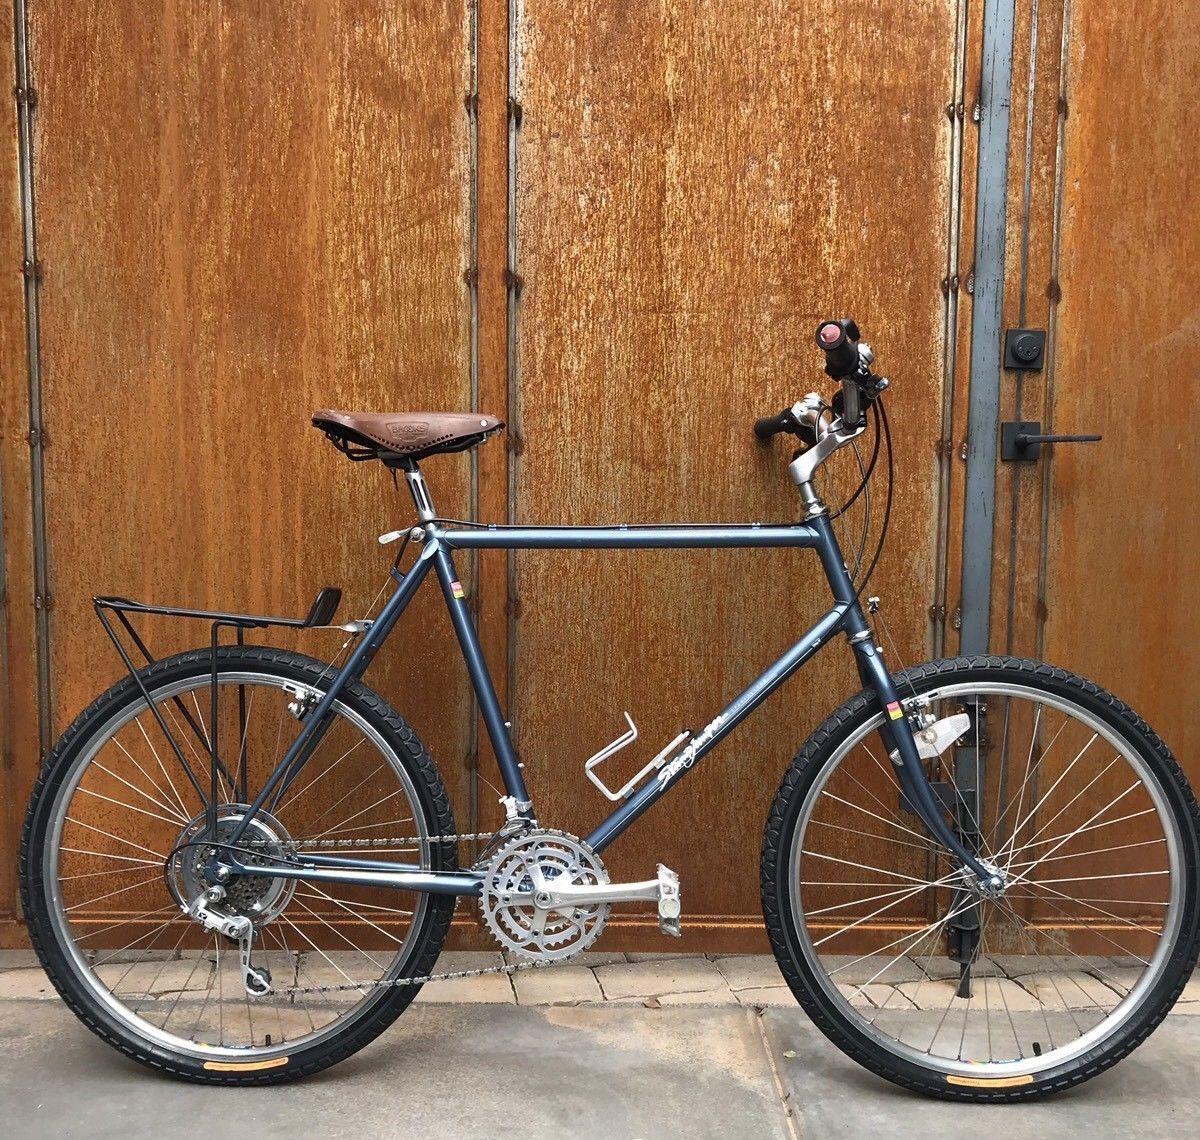 004c8eb8c86 Vintage 1985 Specialized Stumpjumper Mountain Bike, Shimano Deerhead | eBay